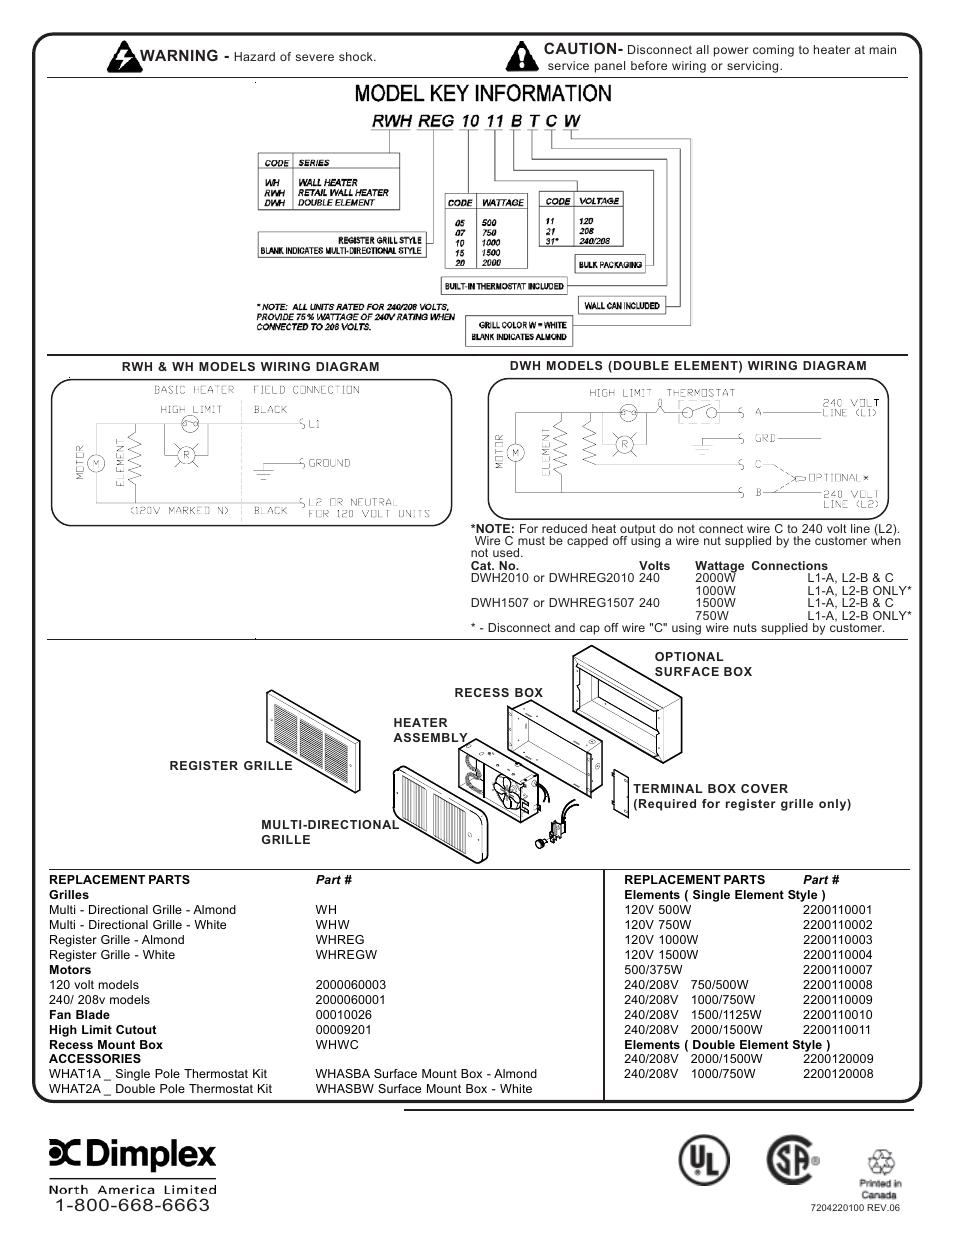 Dimplex 6100770000 User Manual